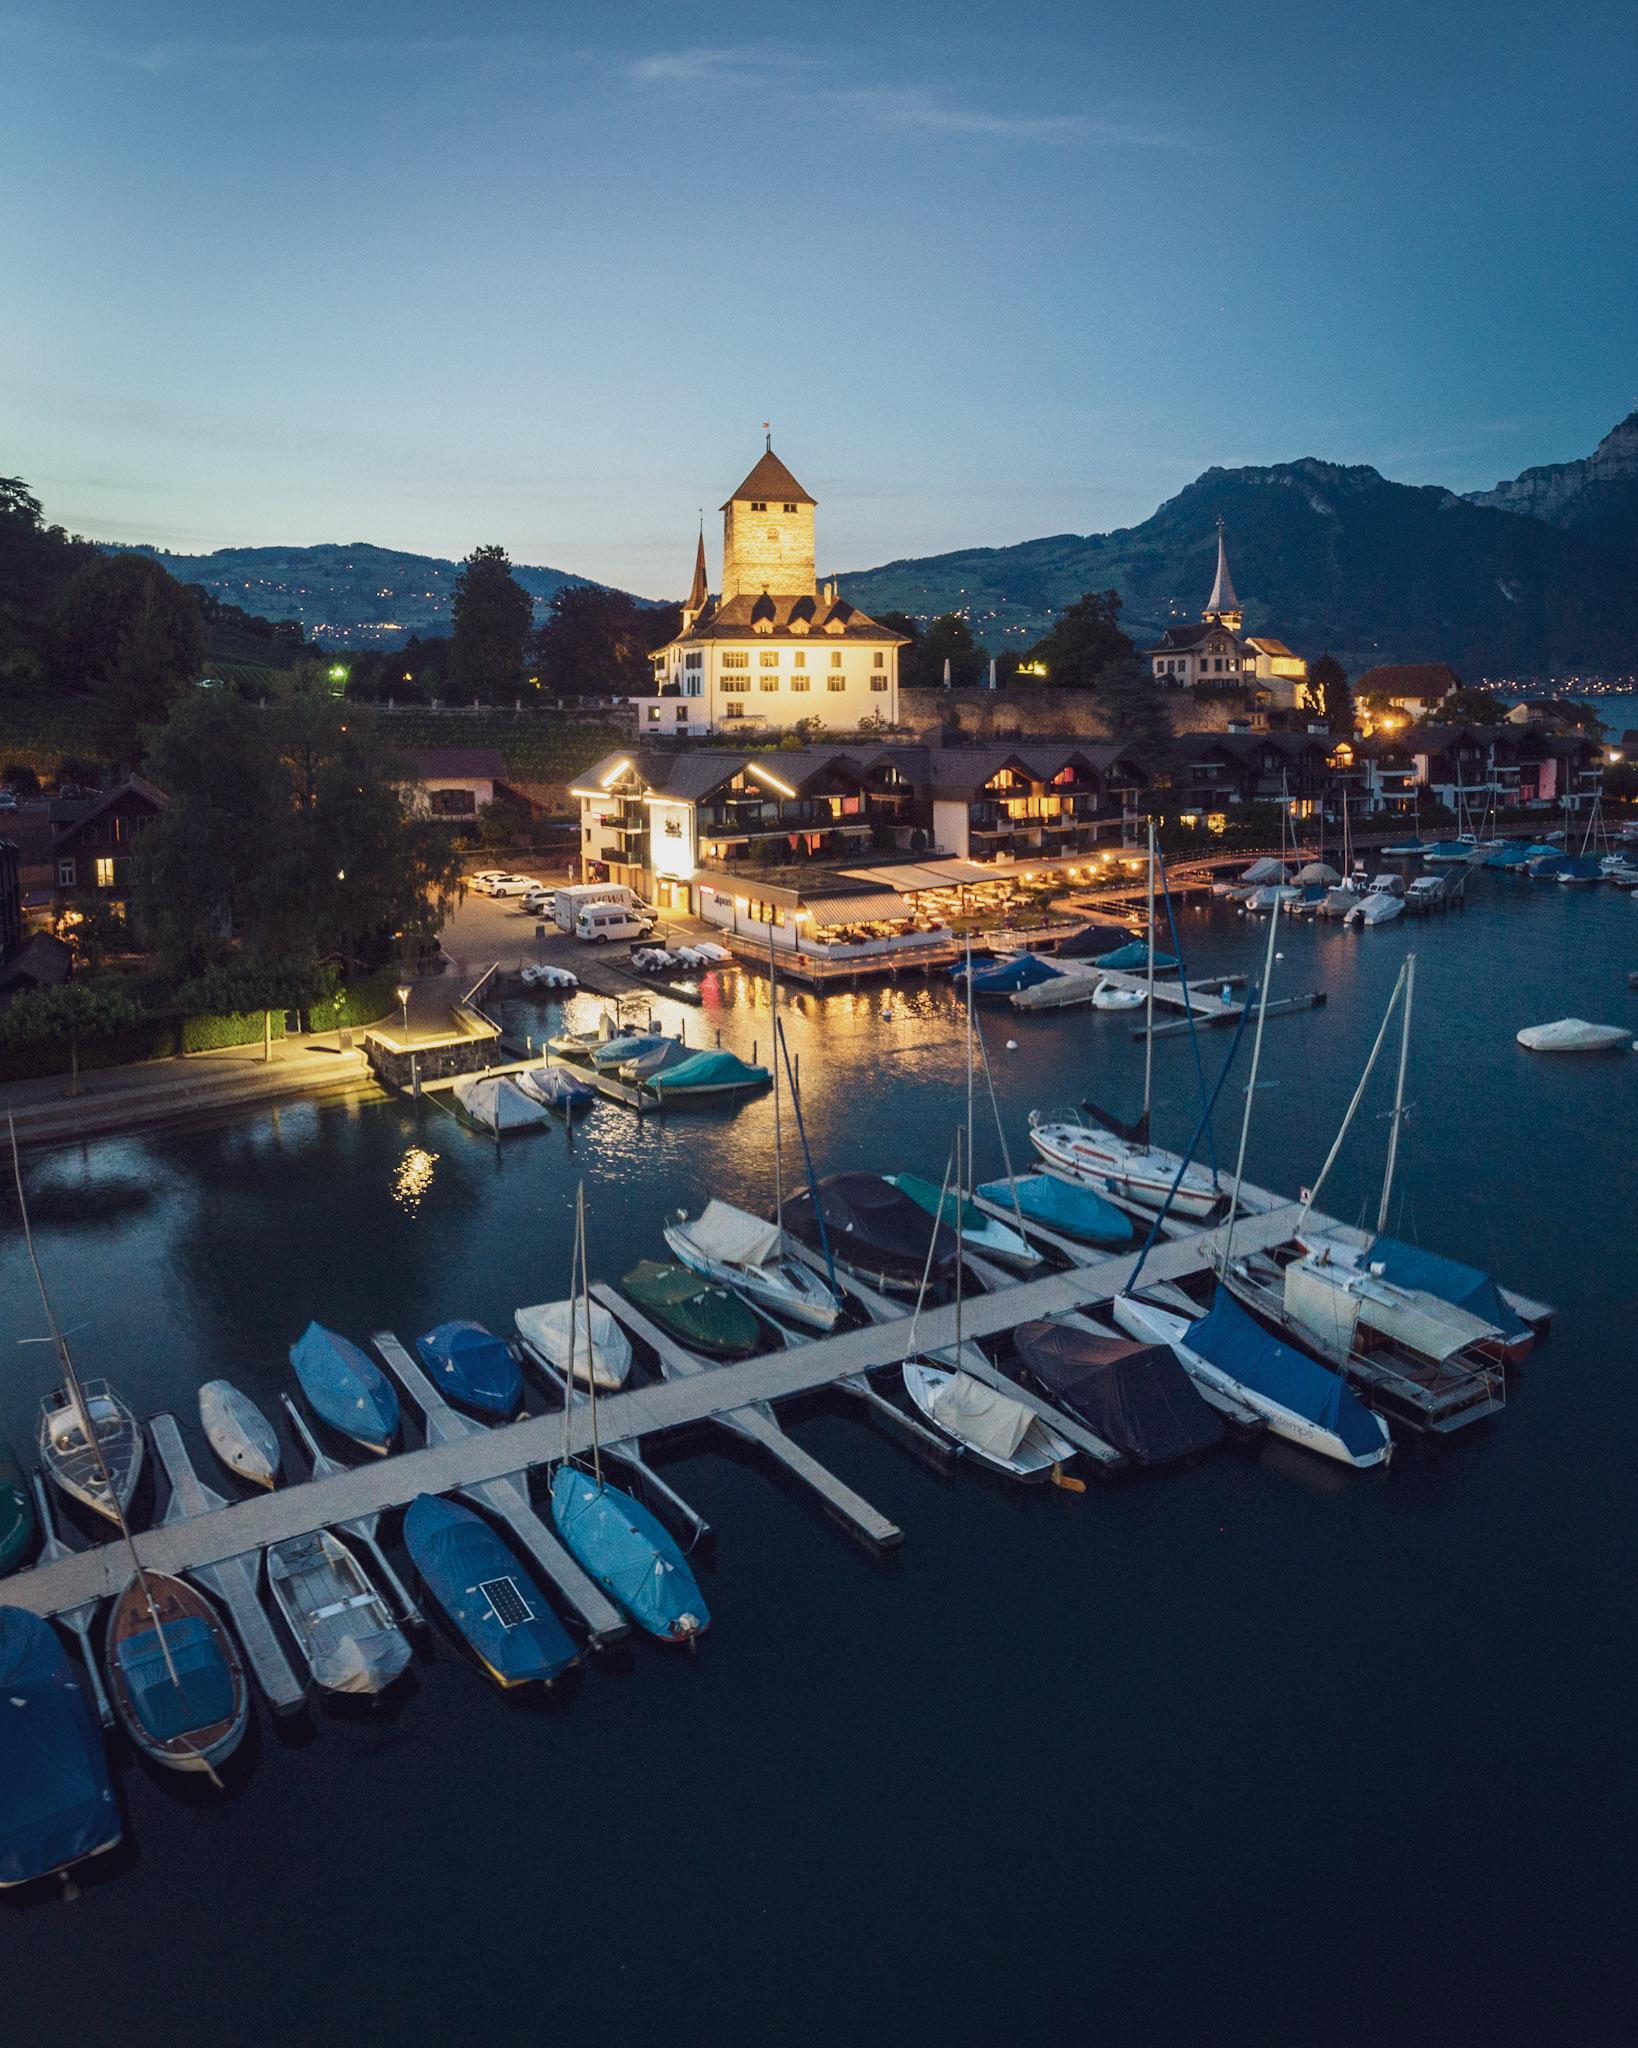 Spiez castle, photographed at dusk using a Mavic Air drone